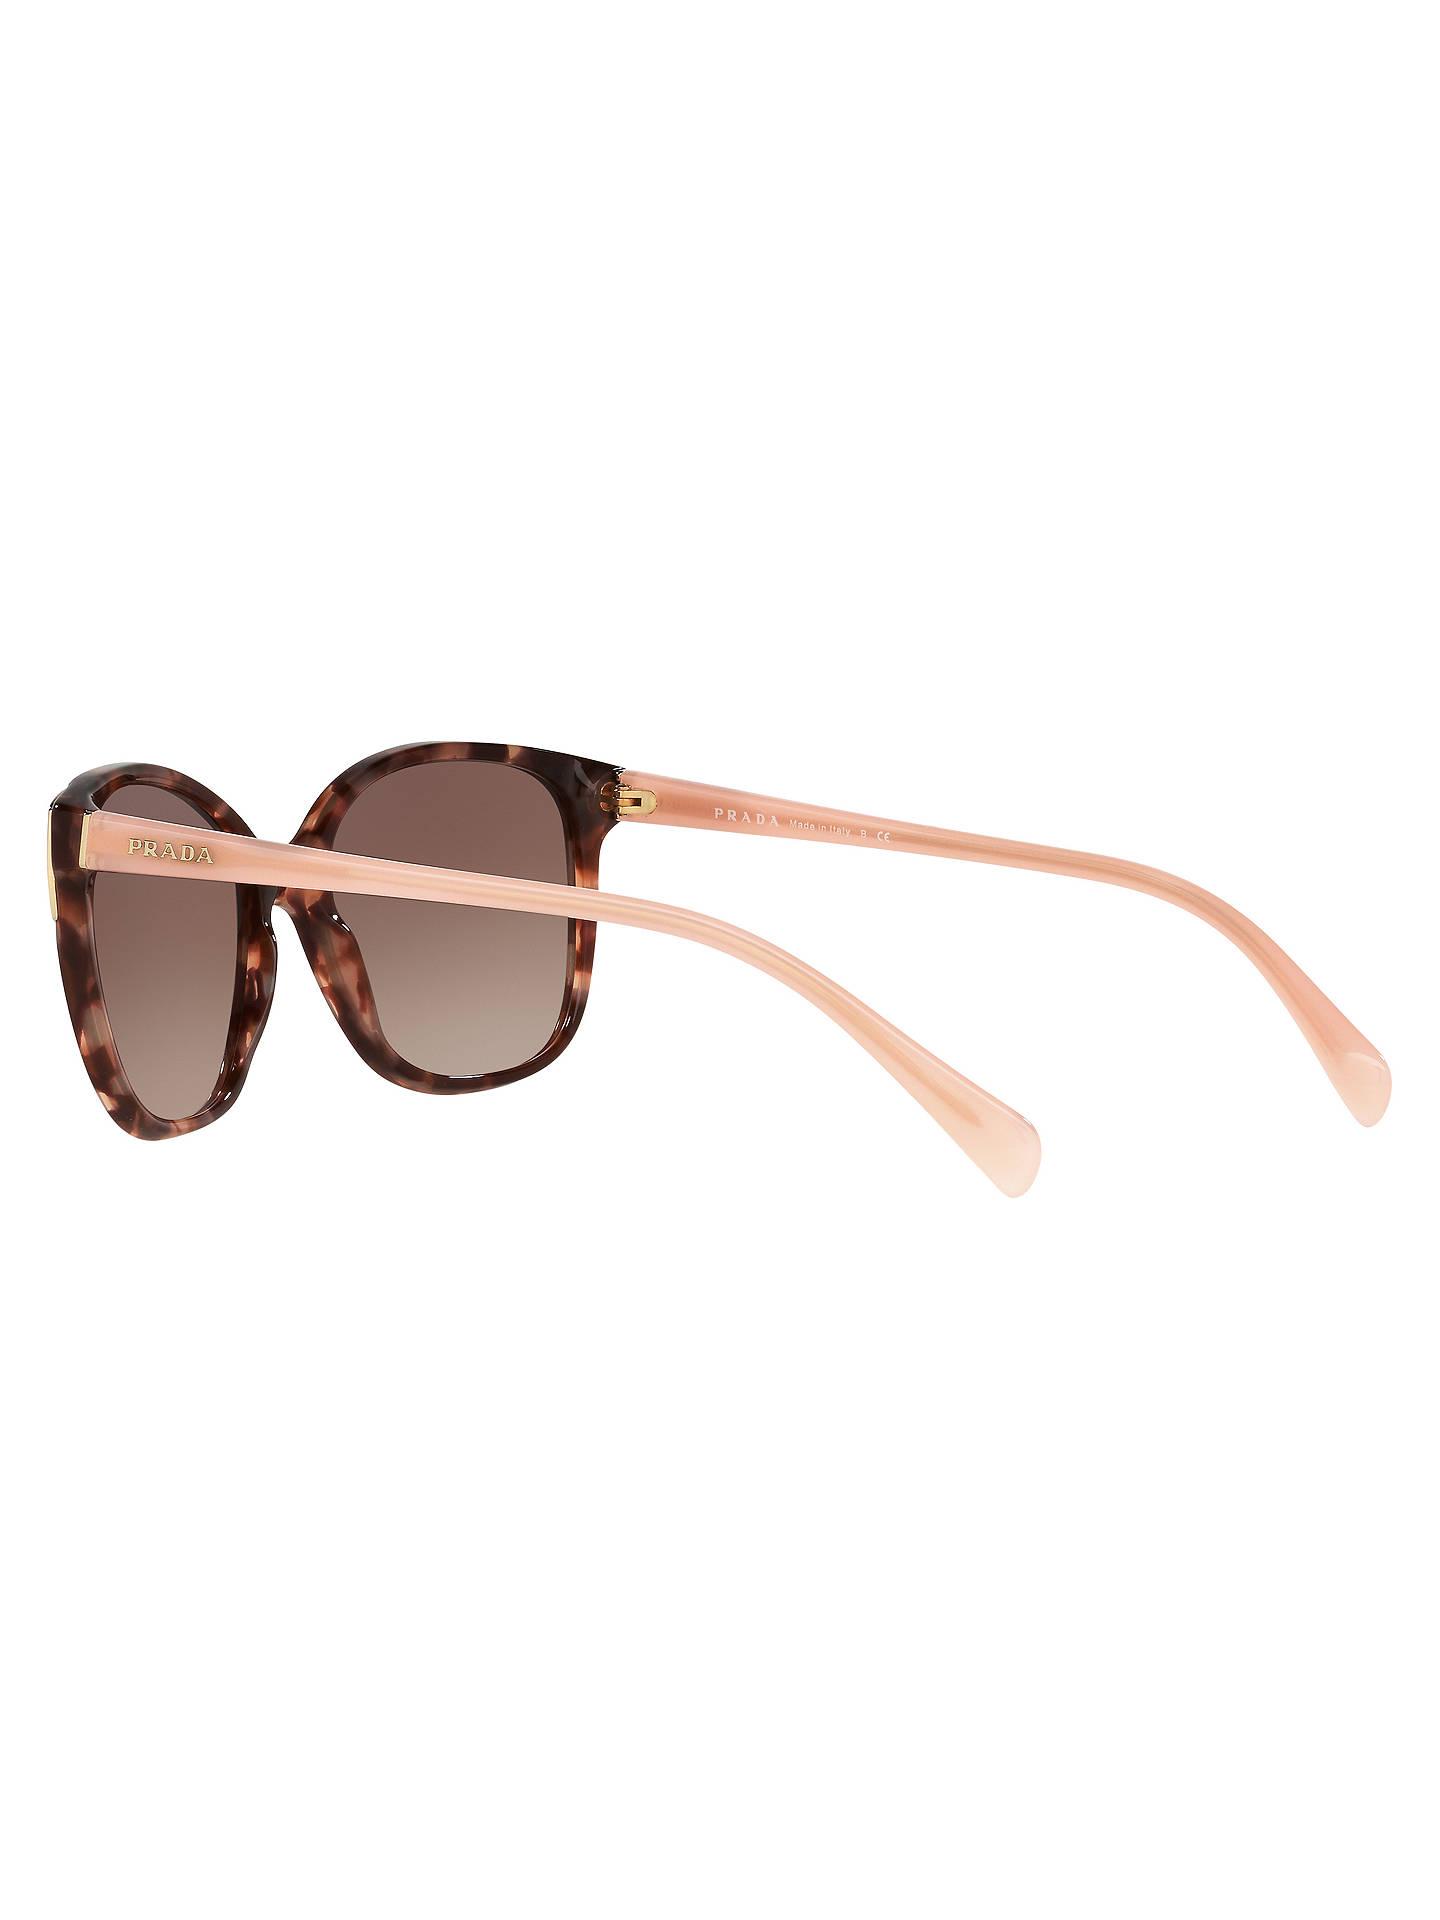 1b7585dc5609 Prada PR 01OS Square Sunglasses at John Lewis   Partners